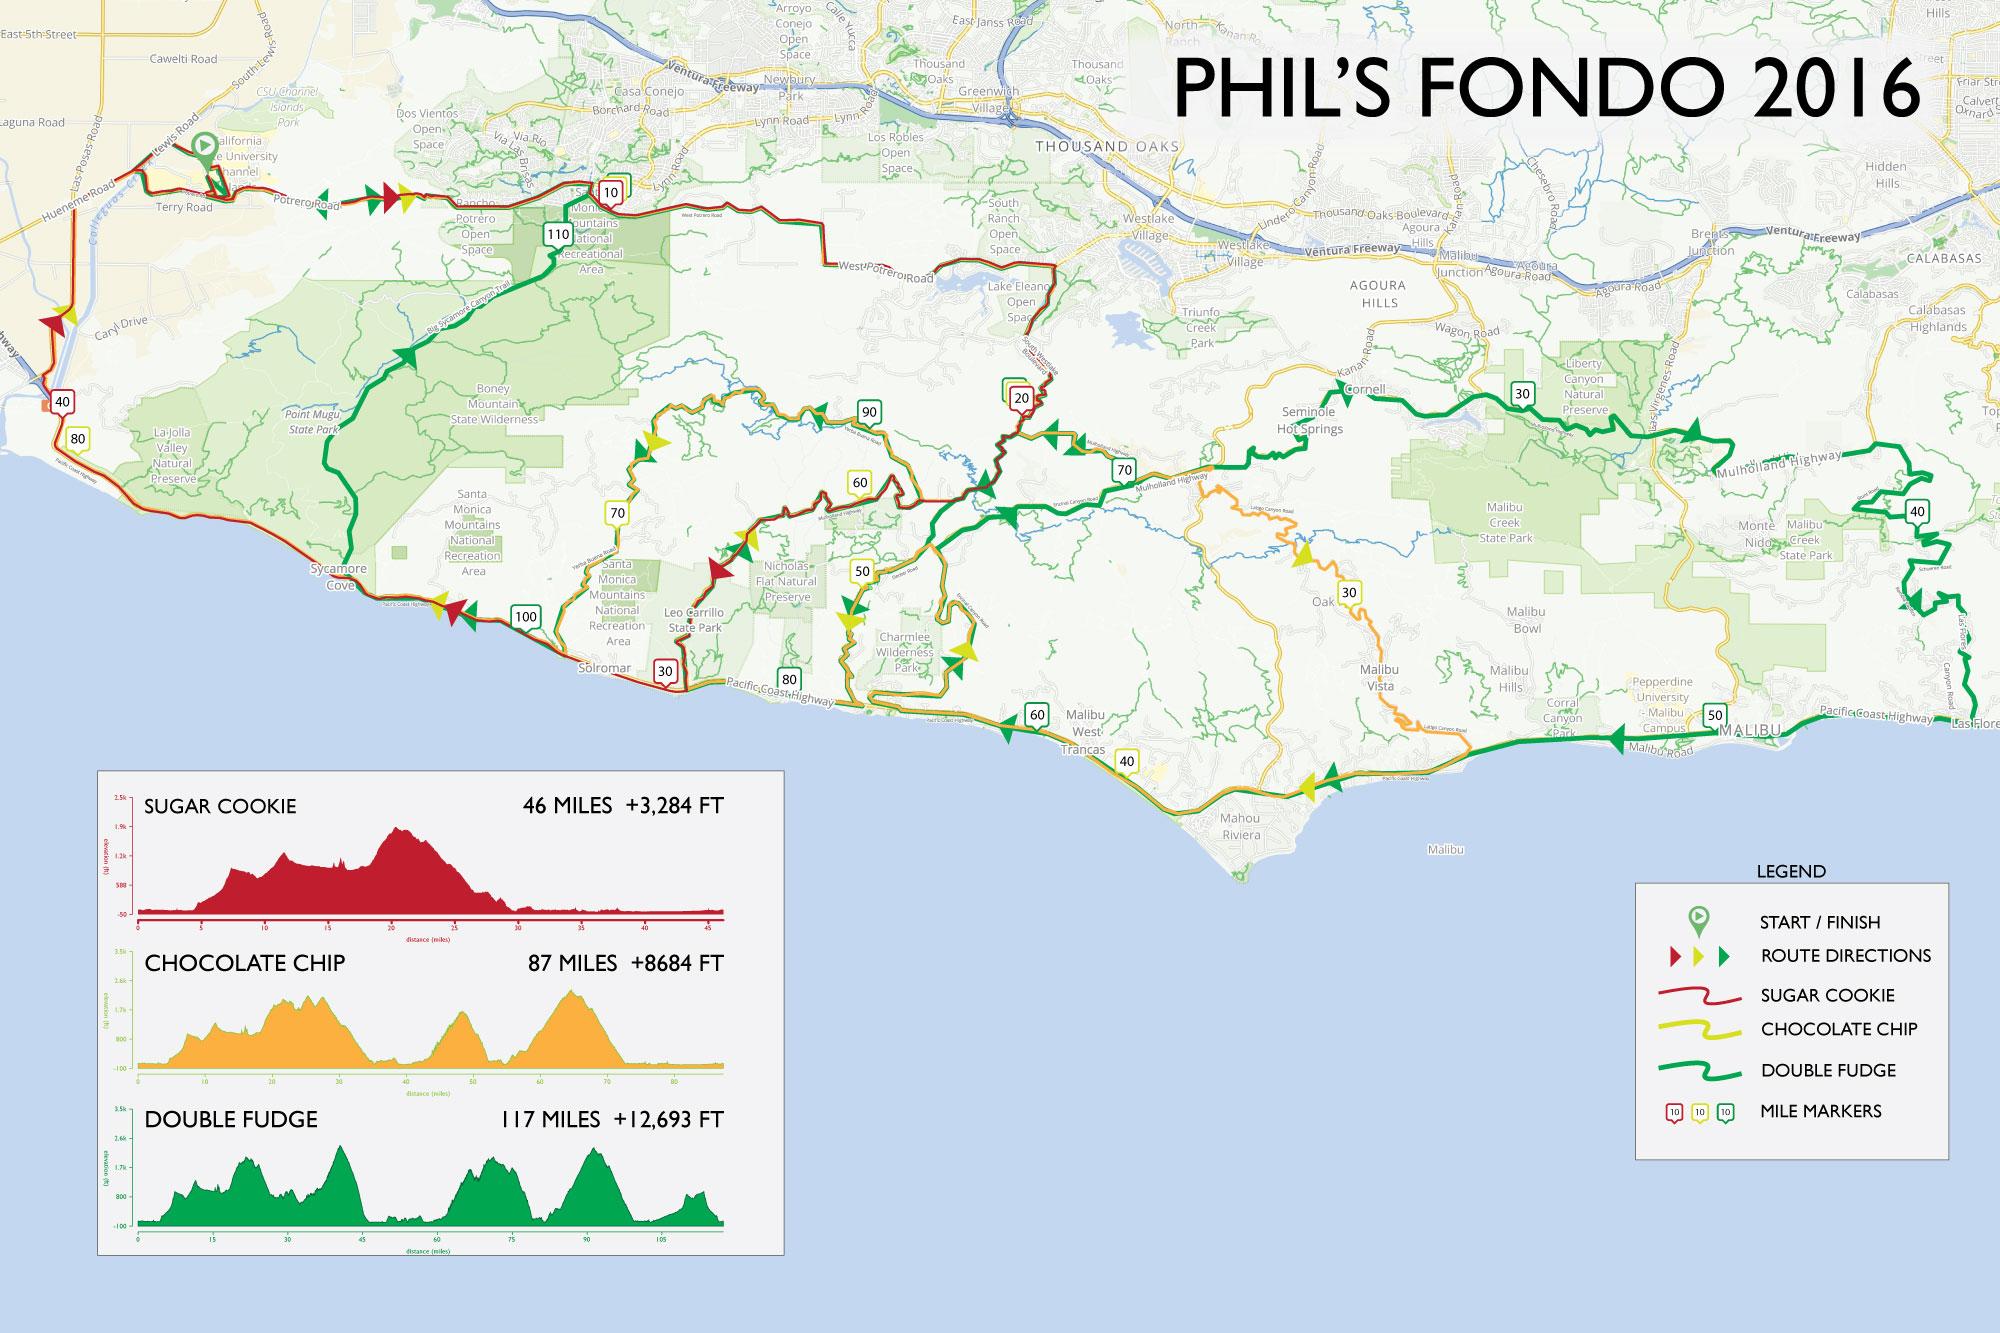 phils-fondo-2016-example